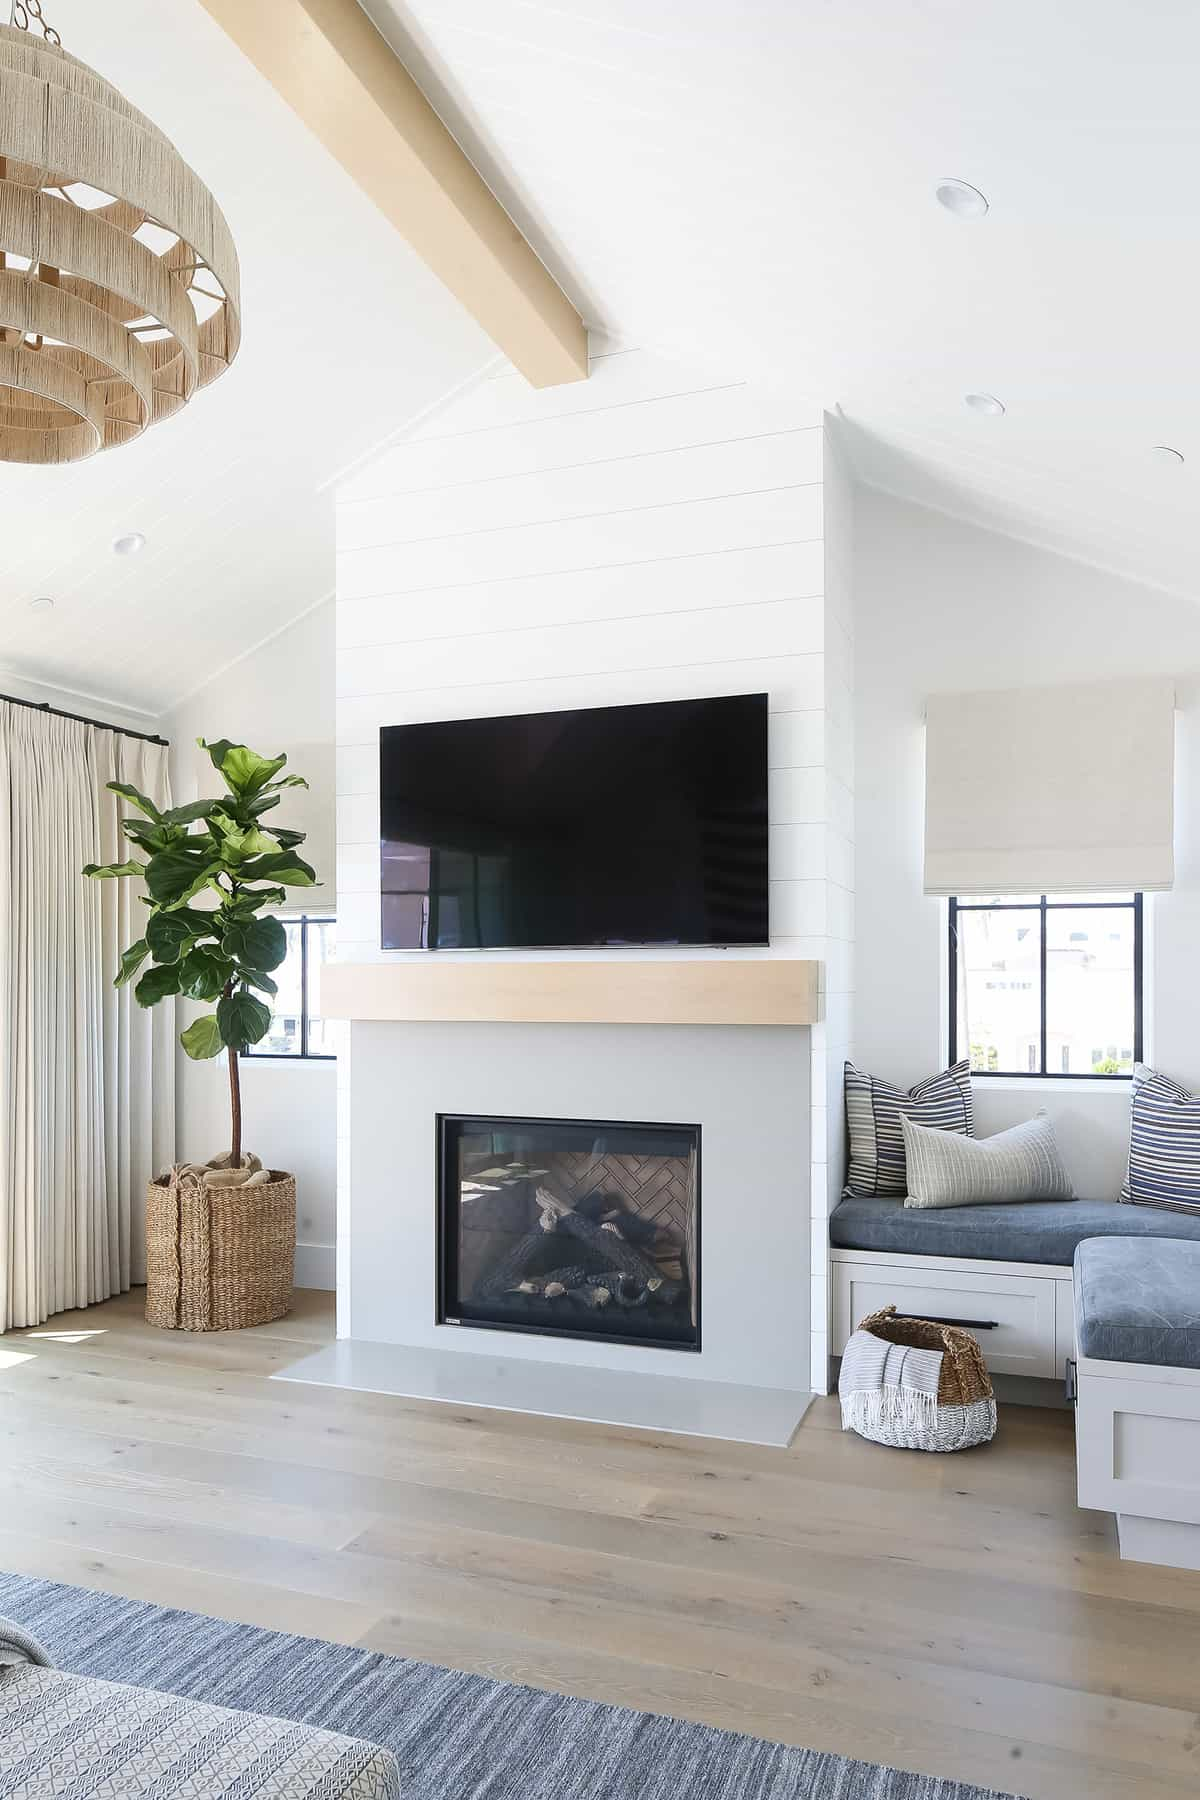 beach-style-bedroom-fireplace